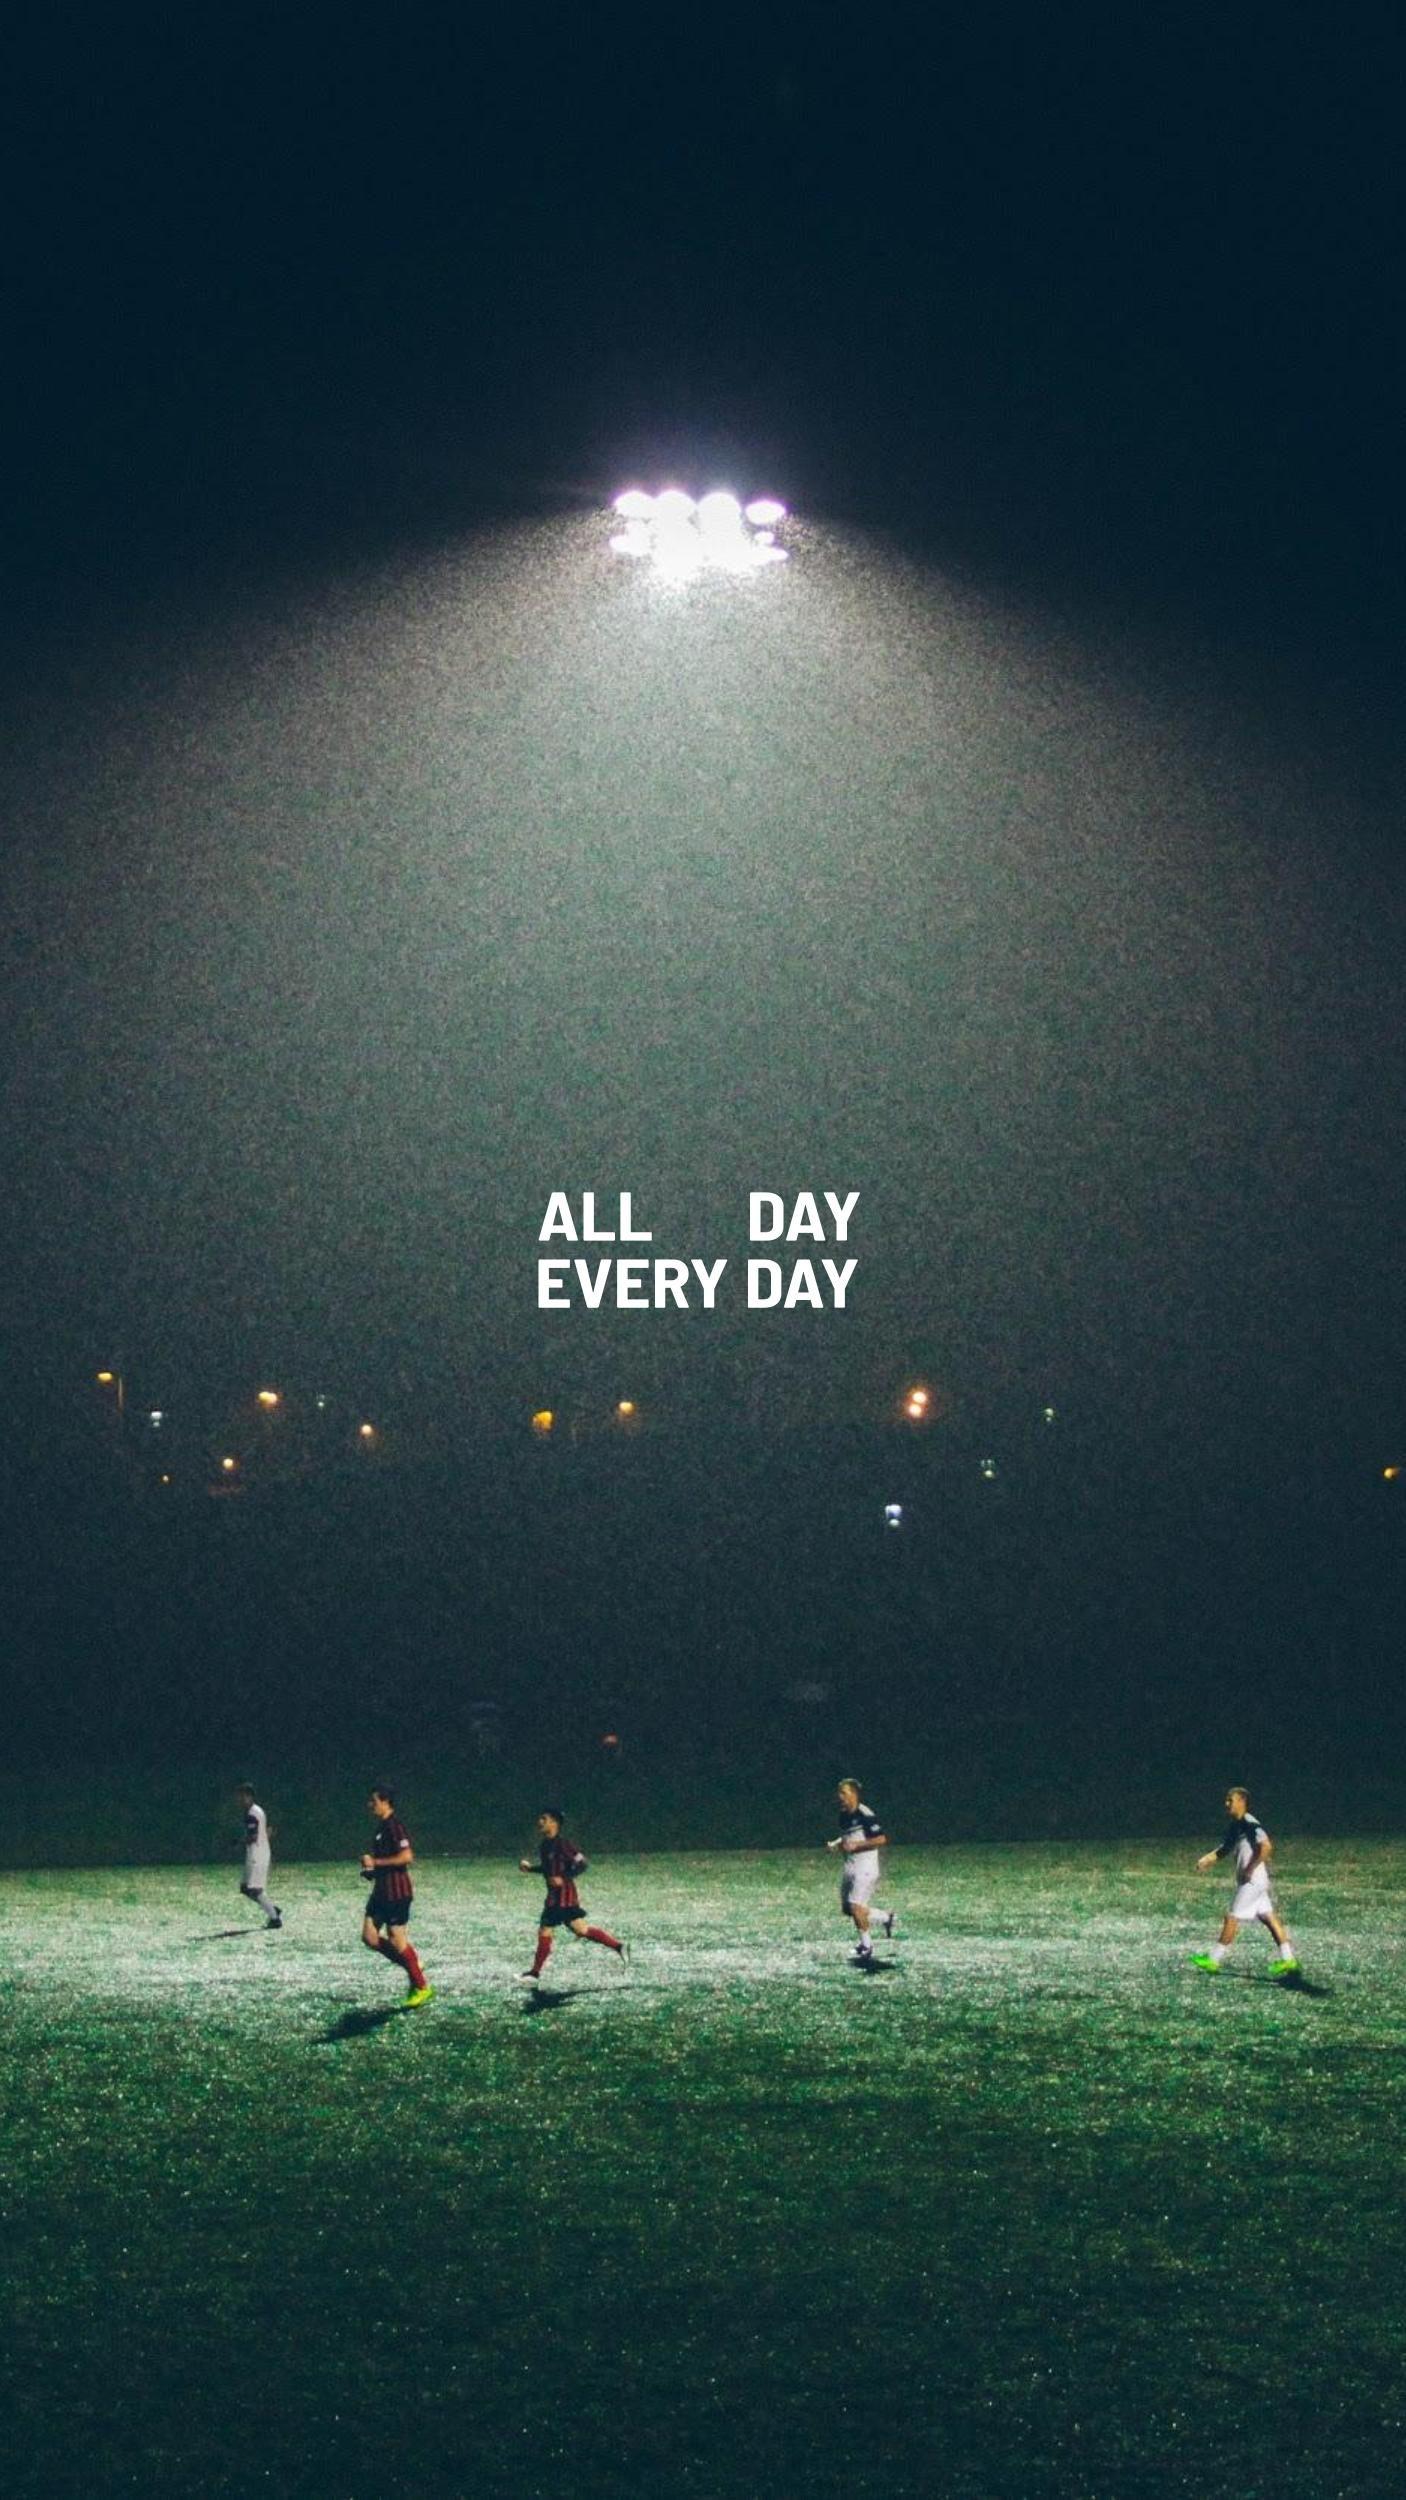 Soccer Wallpapers Consoccer Com Soccer Photography Soccer Motivation Football Wallpaper